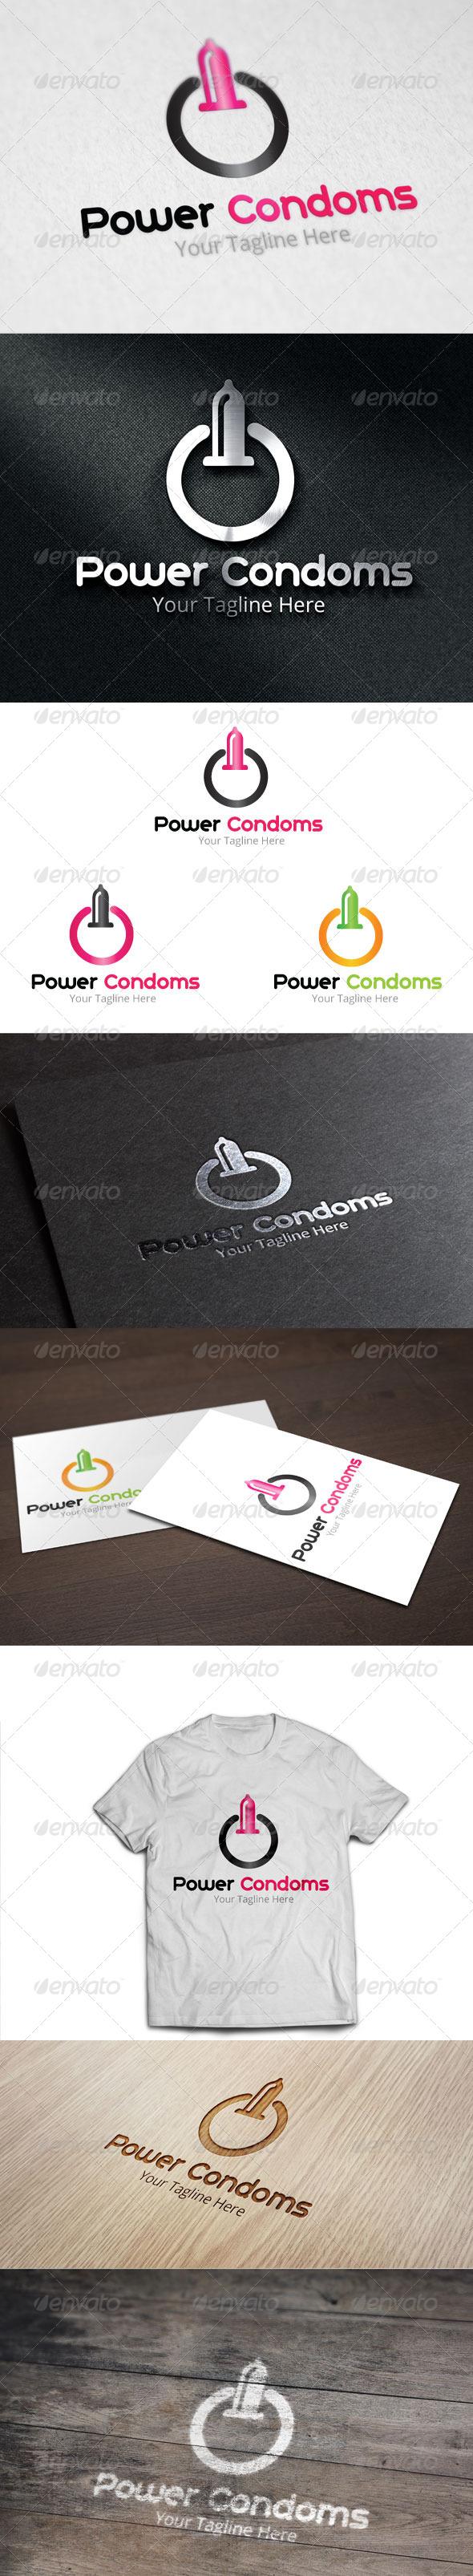 GraphicRiver Power Condoms Logo Template 8294849